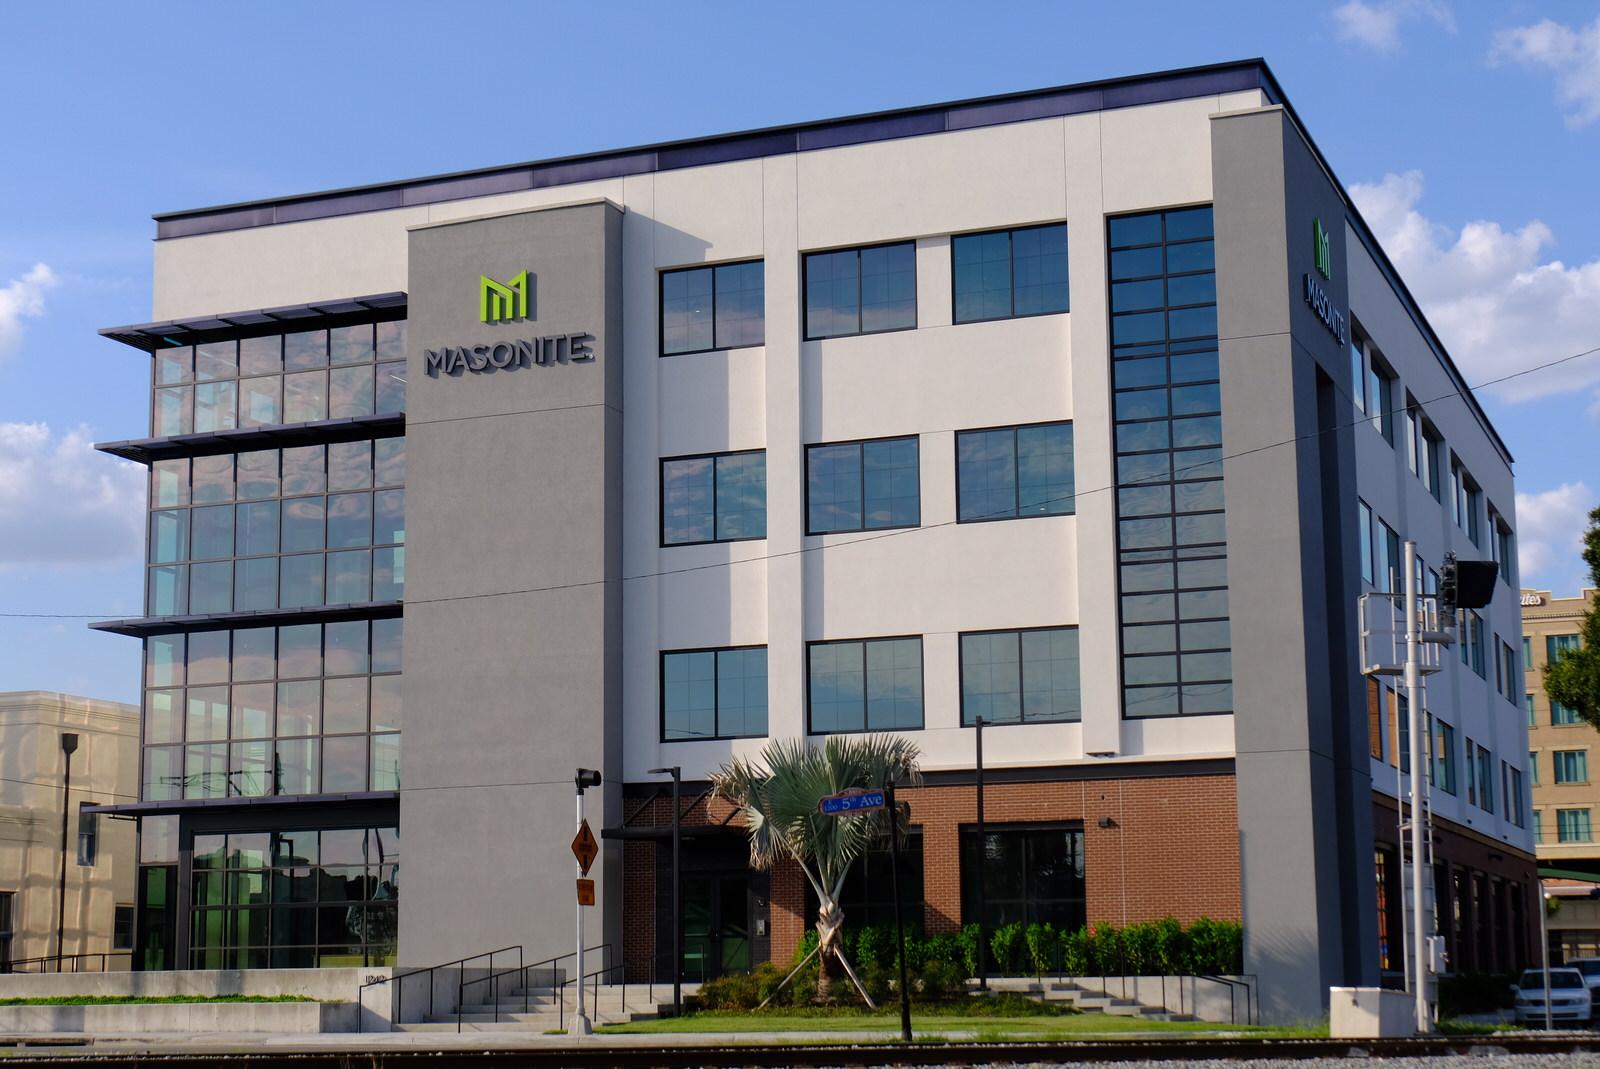 Masonite International's corporate headquarters in Tampa, Florida.